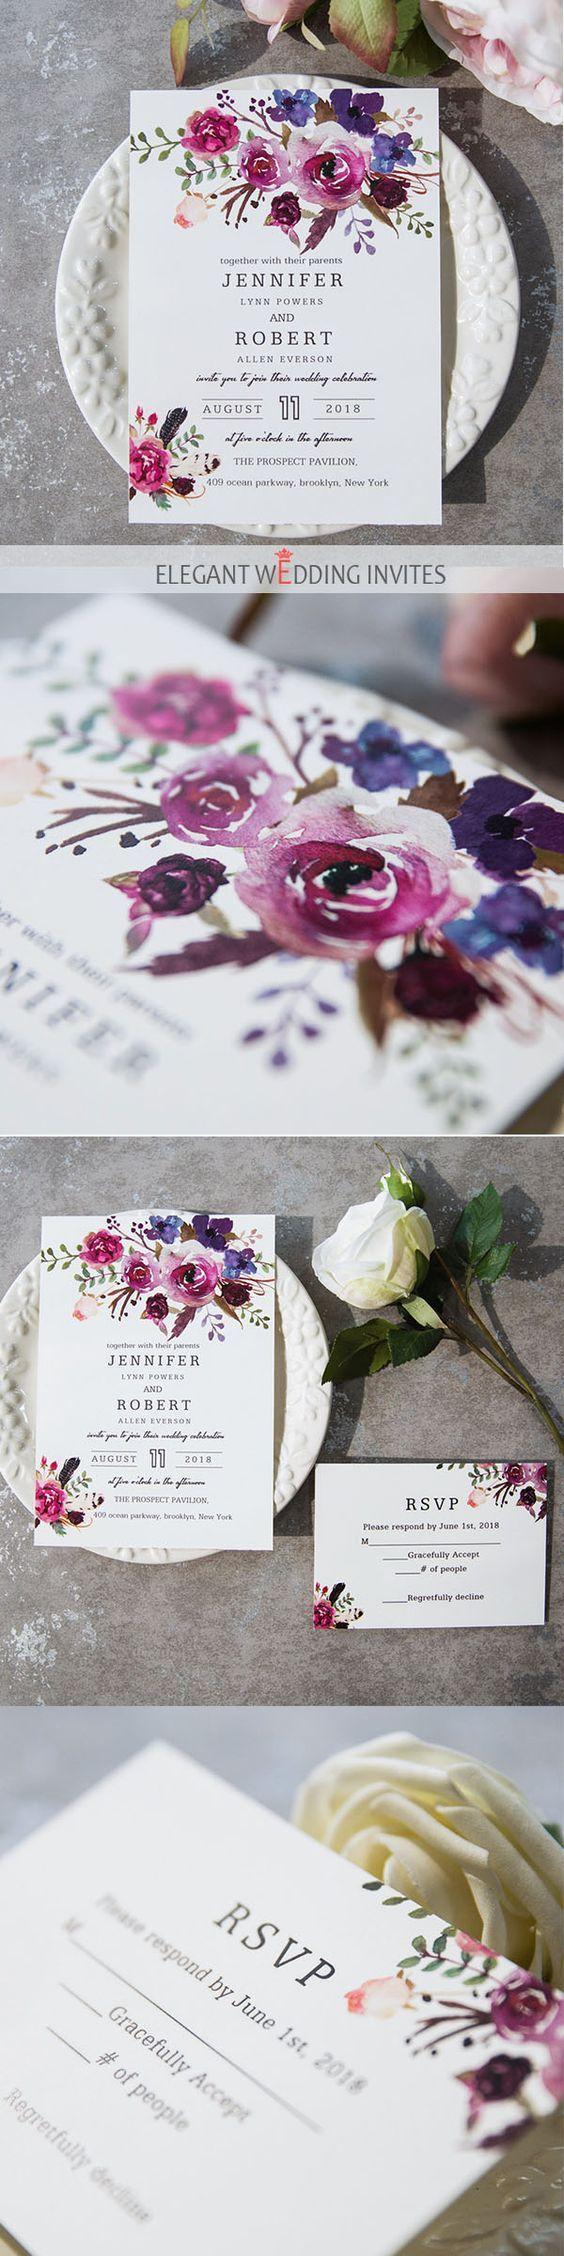 Lavender decor for wedding spring magenta shades of purple wedding invitations EWI  Tiffany